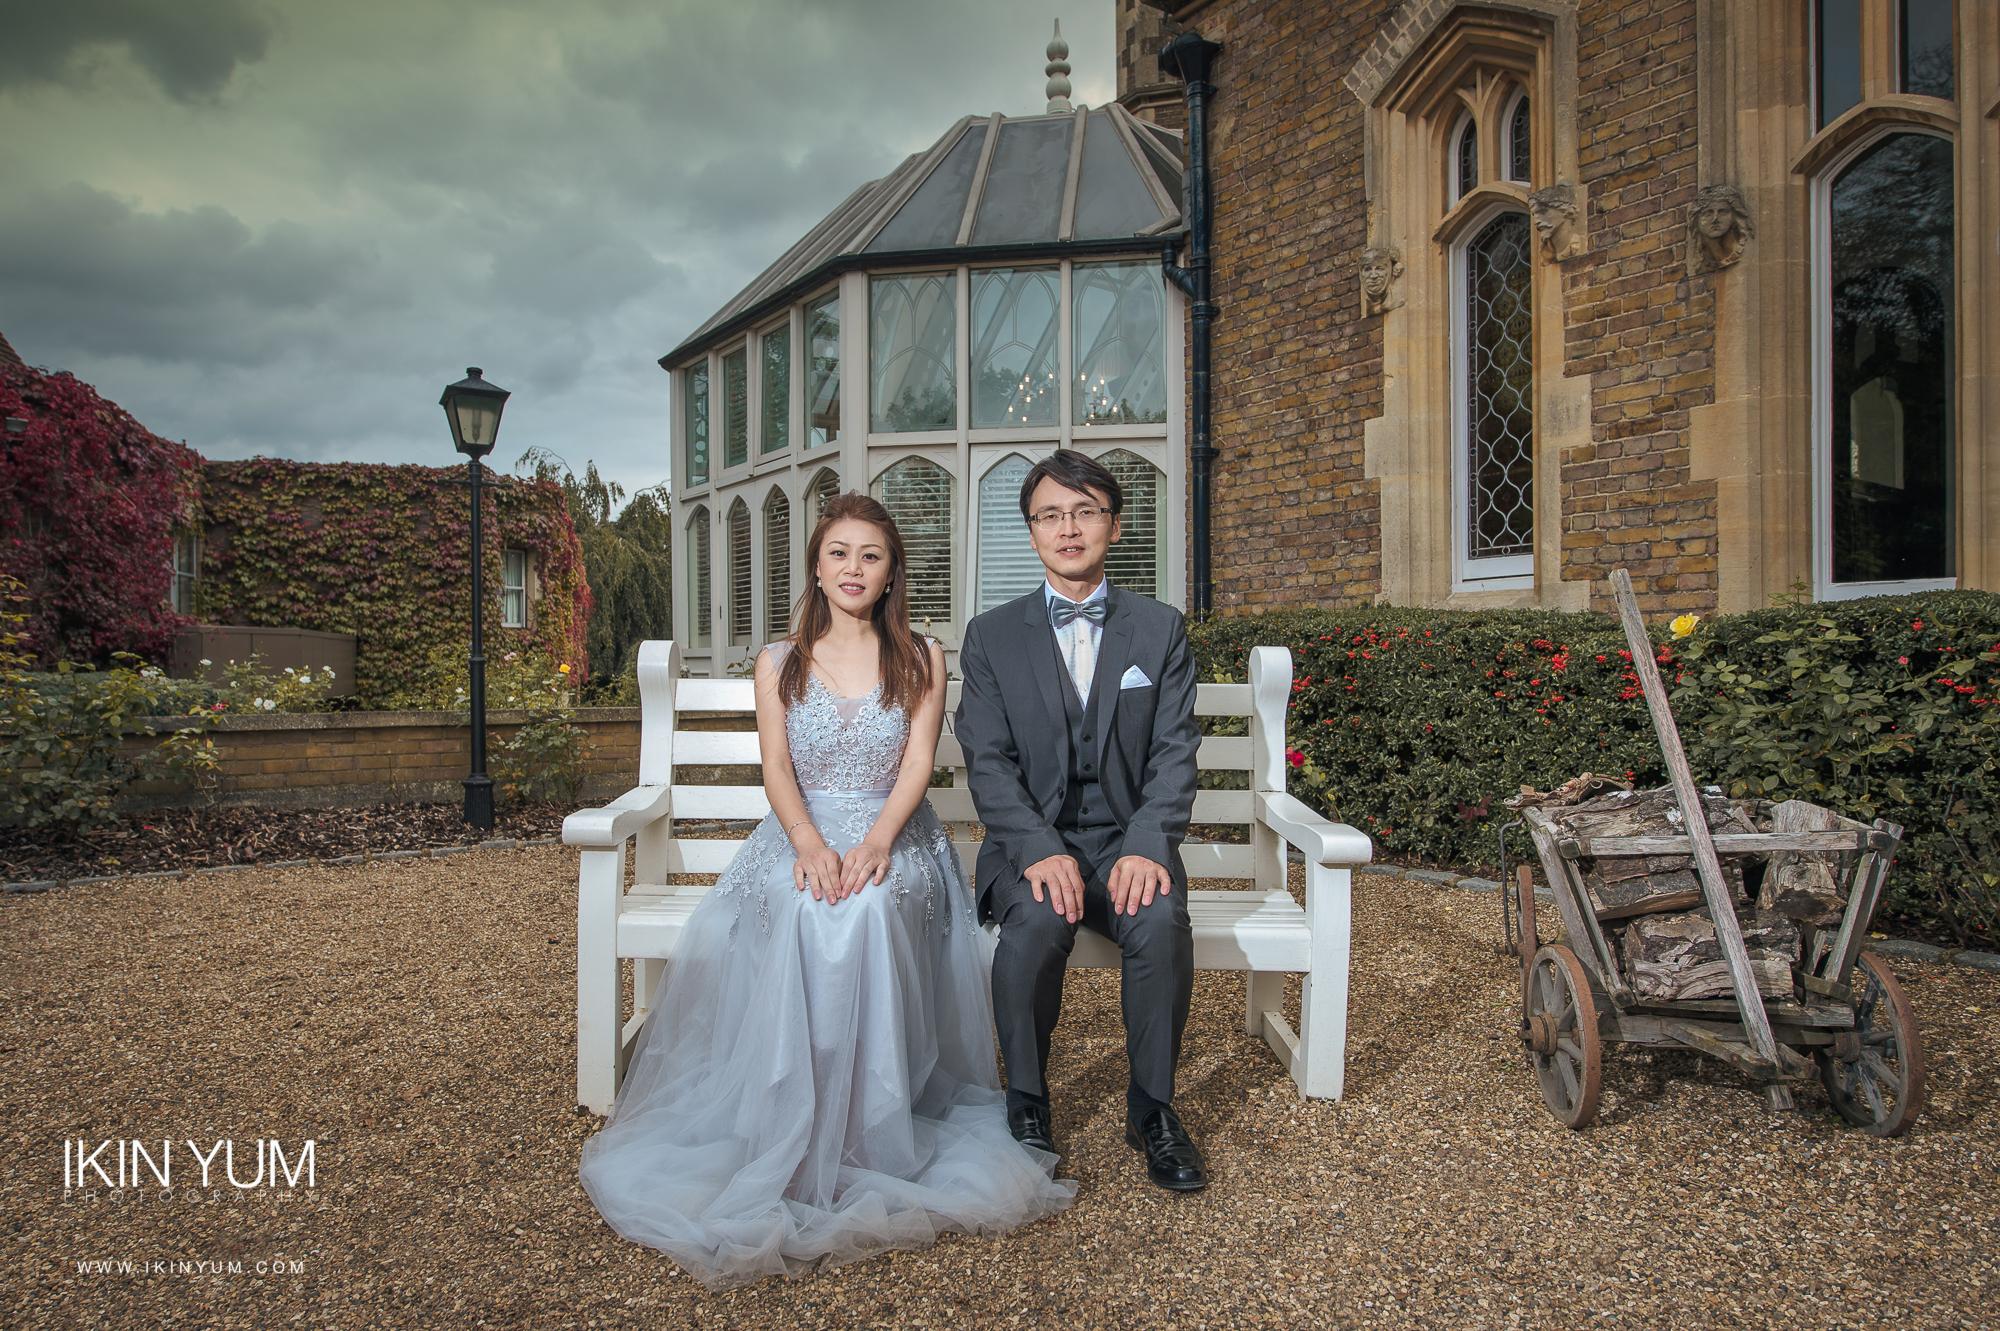 The oakley court Pre-Wedding Shoot - Ikin Yum Photography-047.jpg